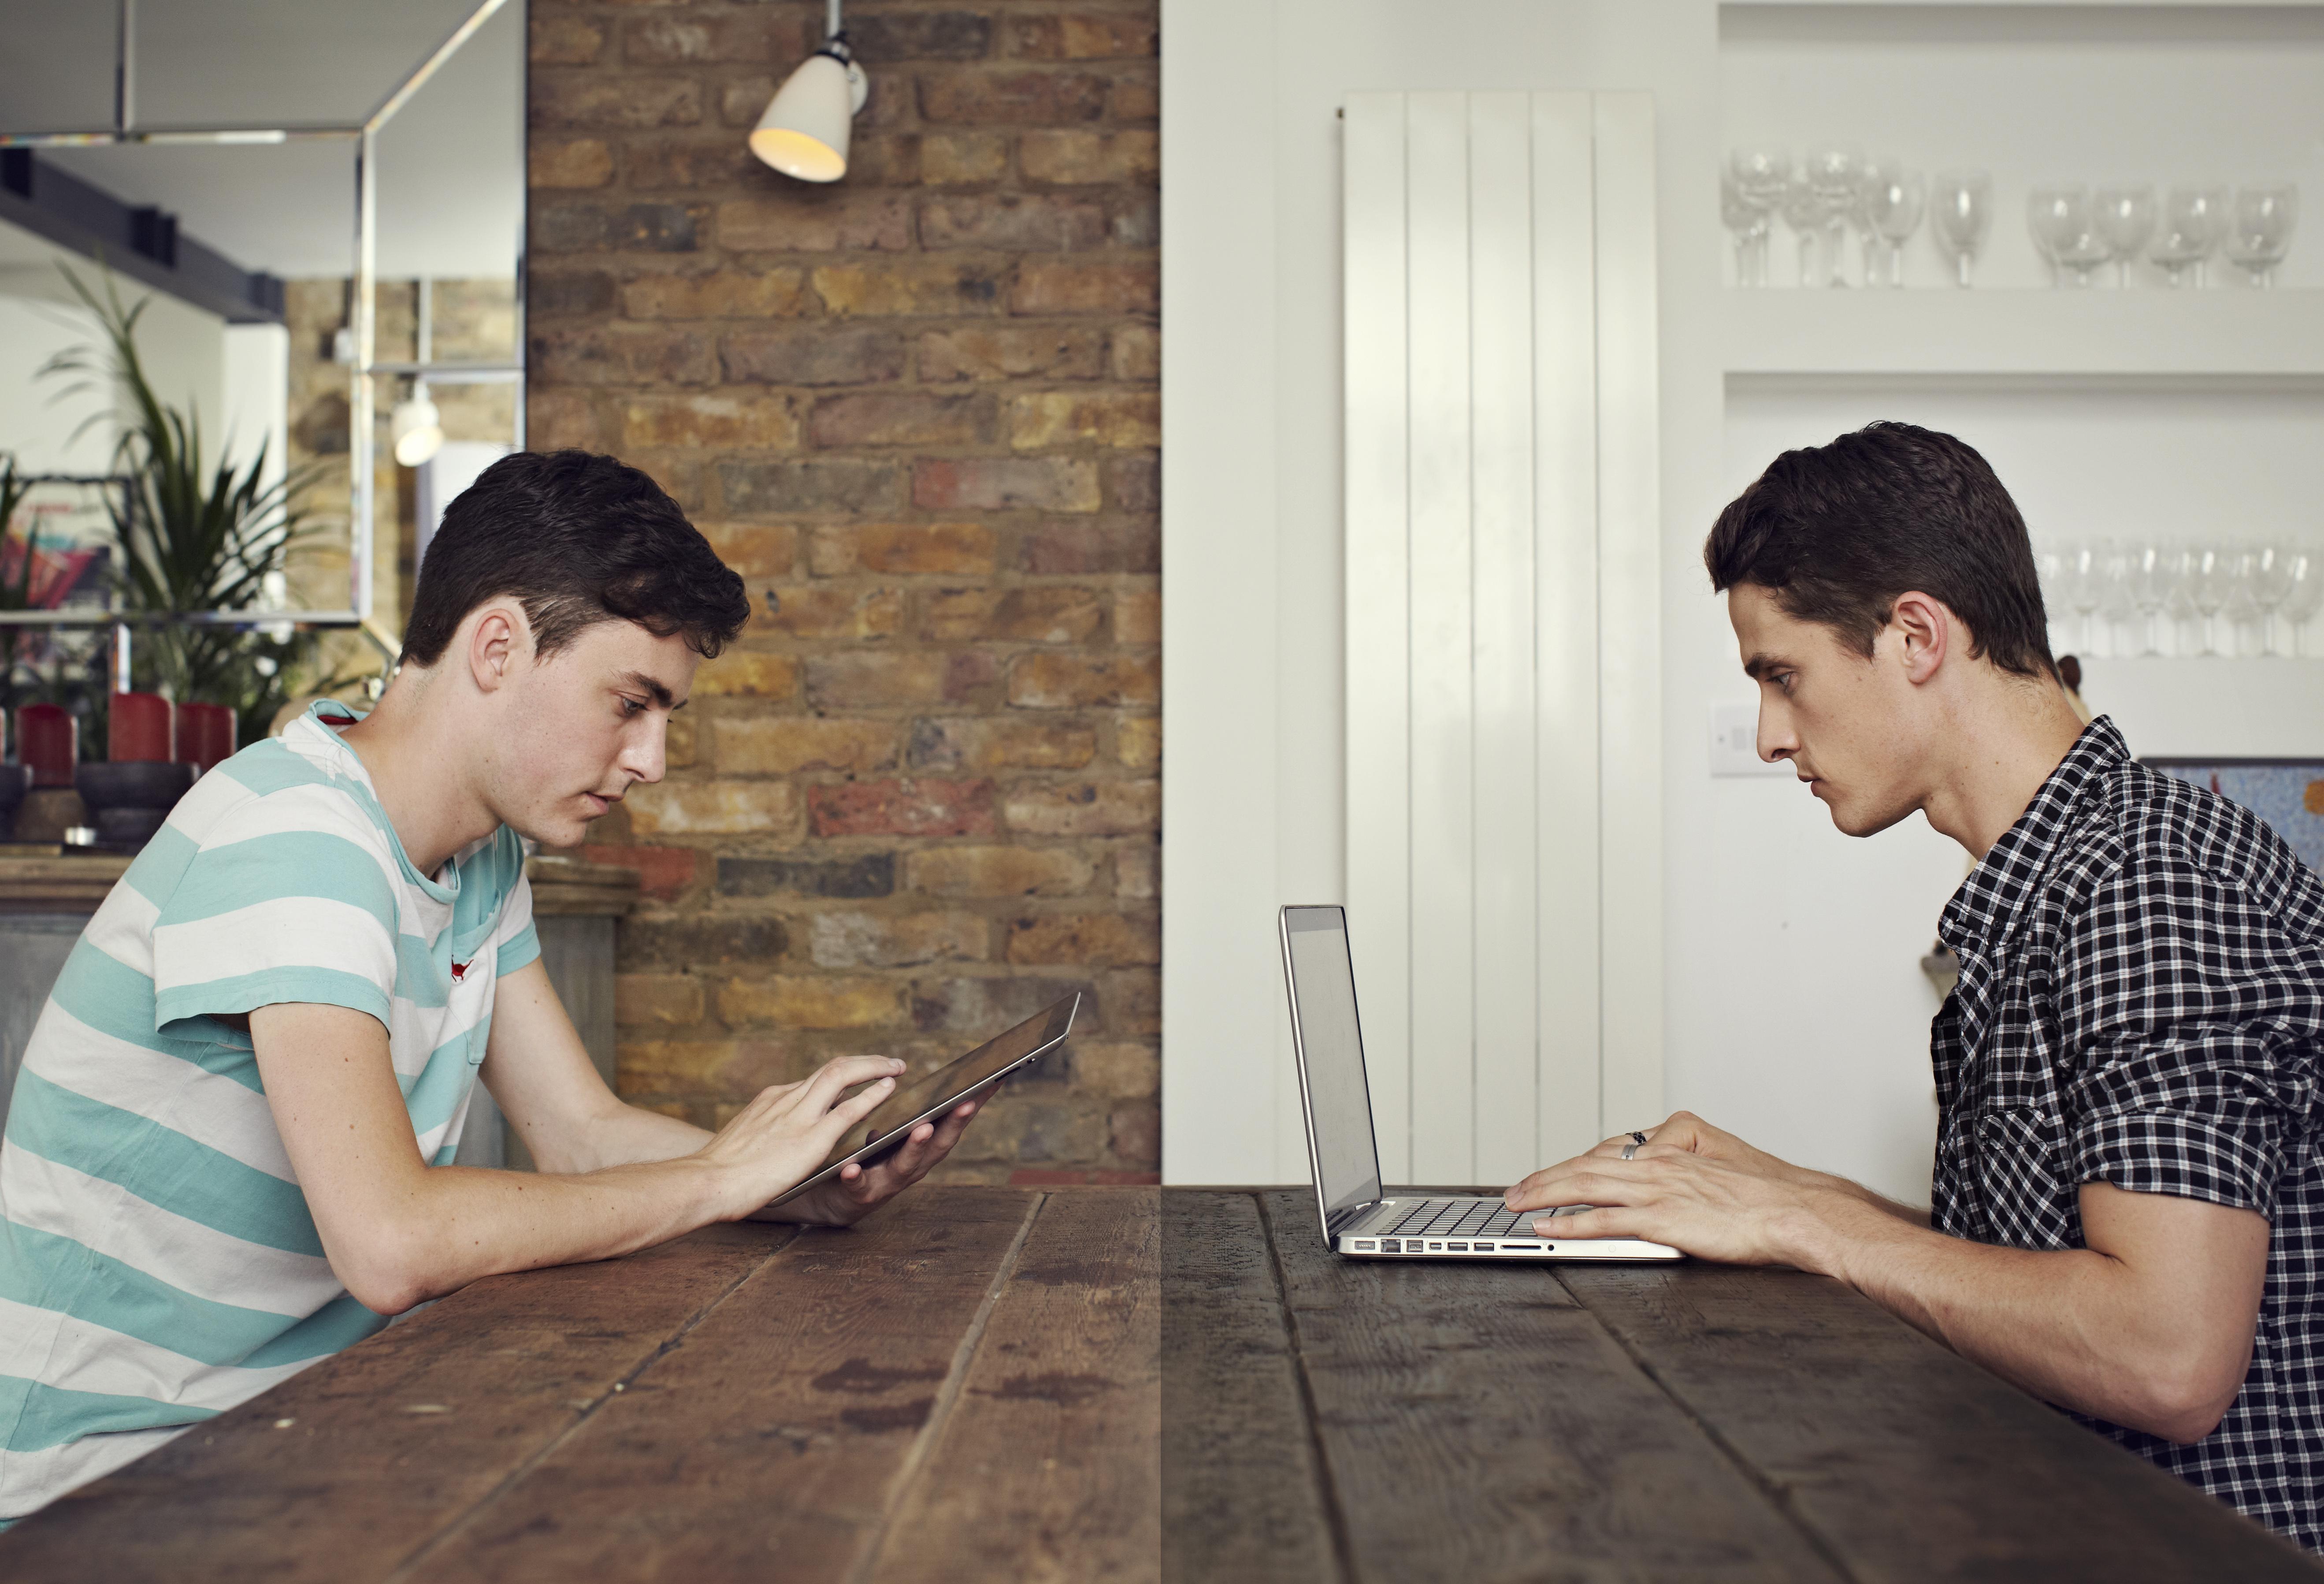 Men communicating through computers